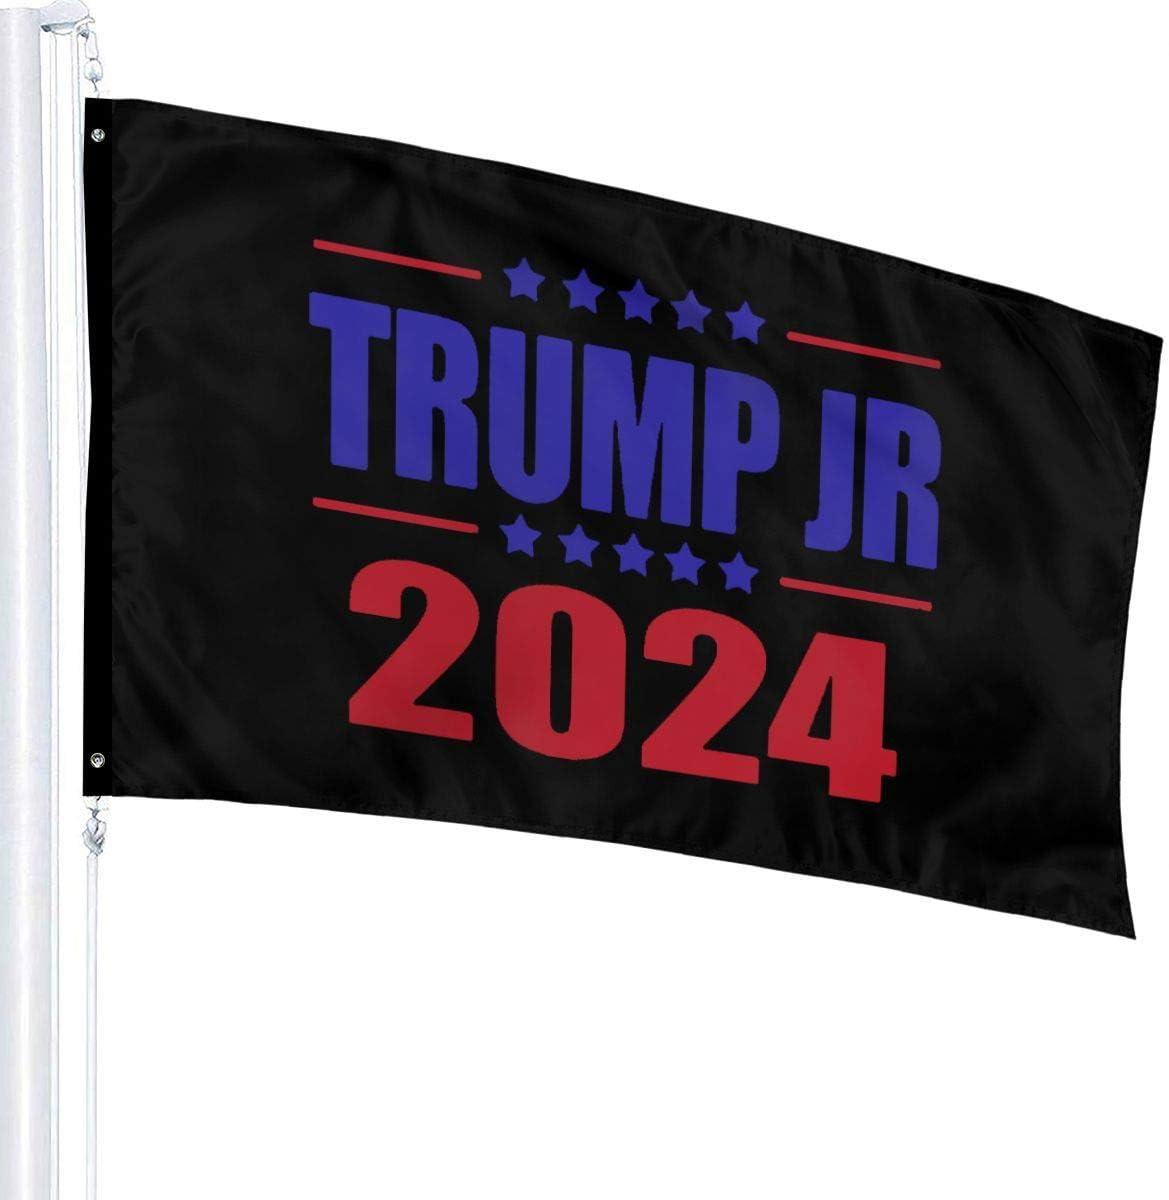 Amazon.com : Wah Donald Trump Jr 2024 ...